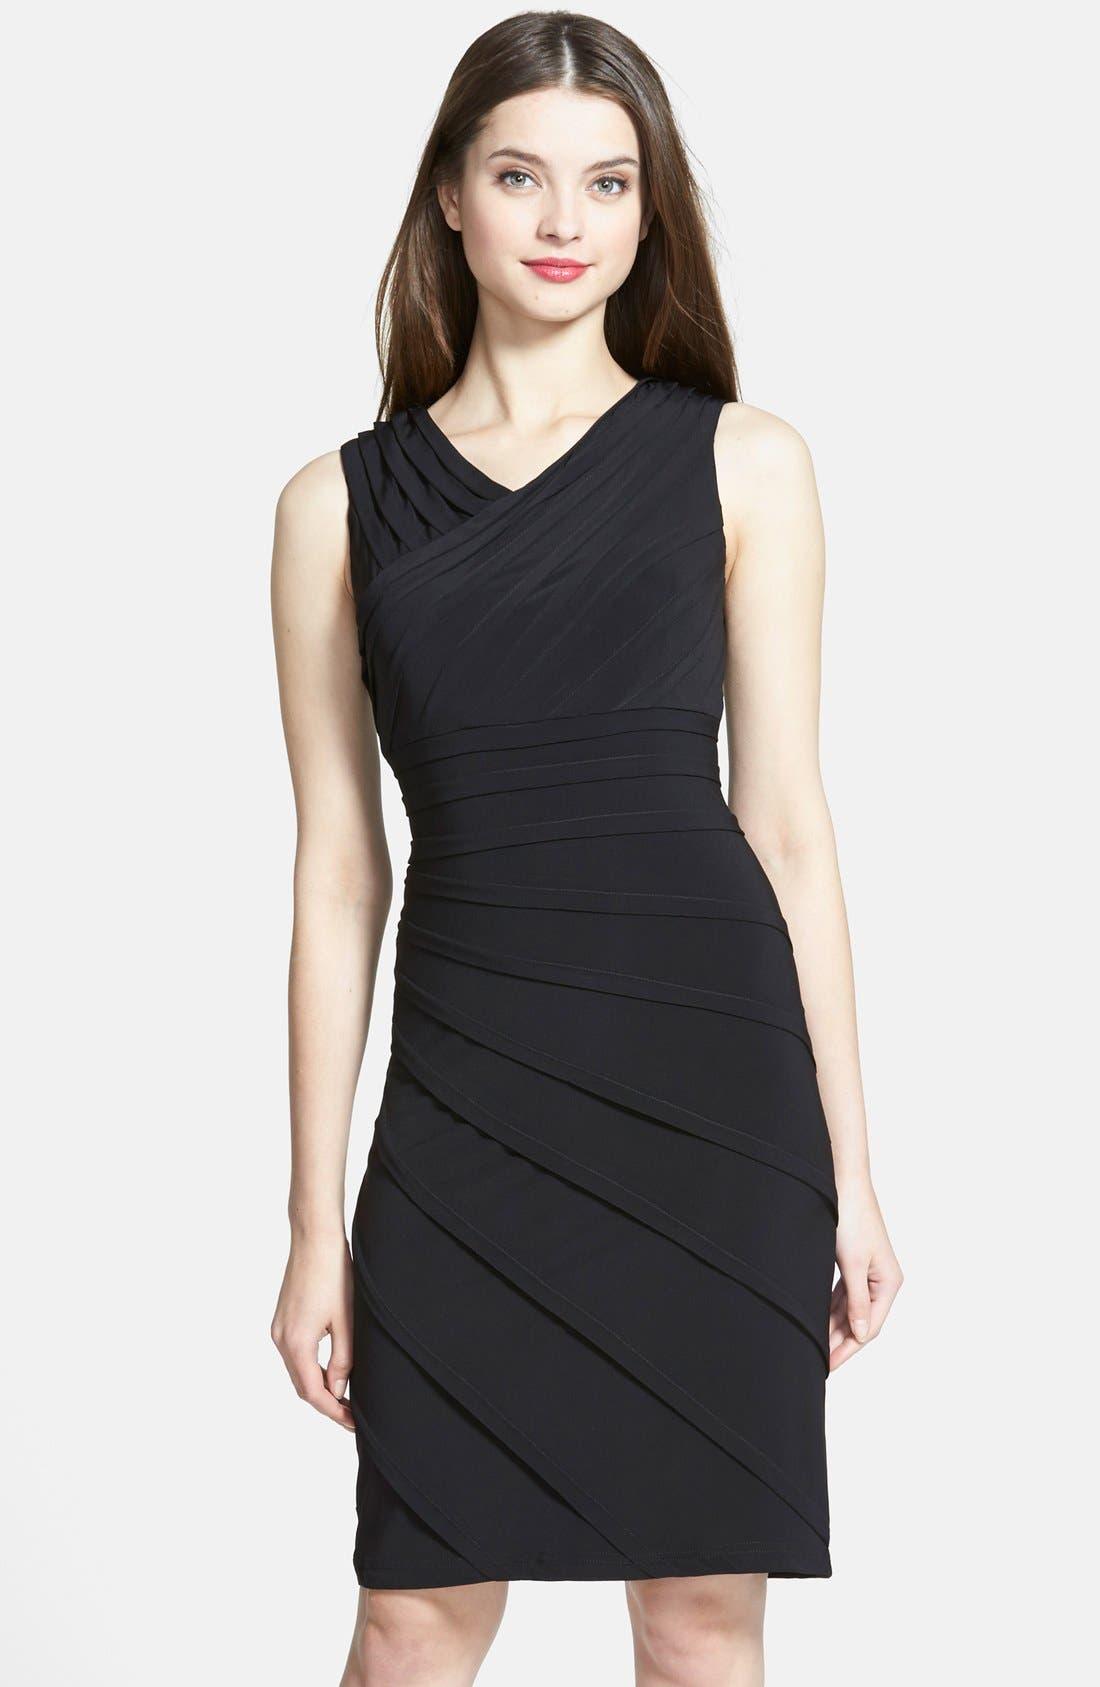 ADRIANNA PAPELL, V-Neck Shutter Pleat Sheath Dress, Main thumbnail 1, color, 001